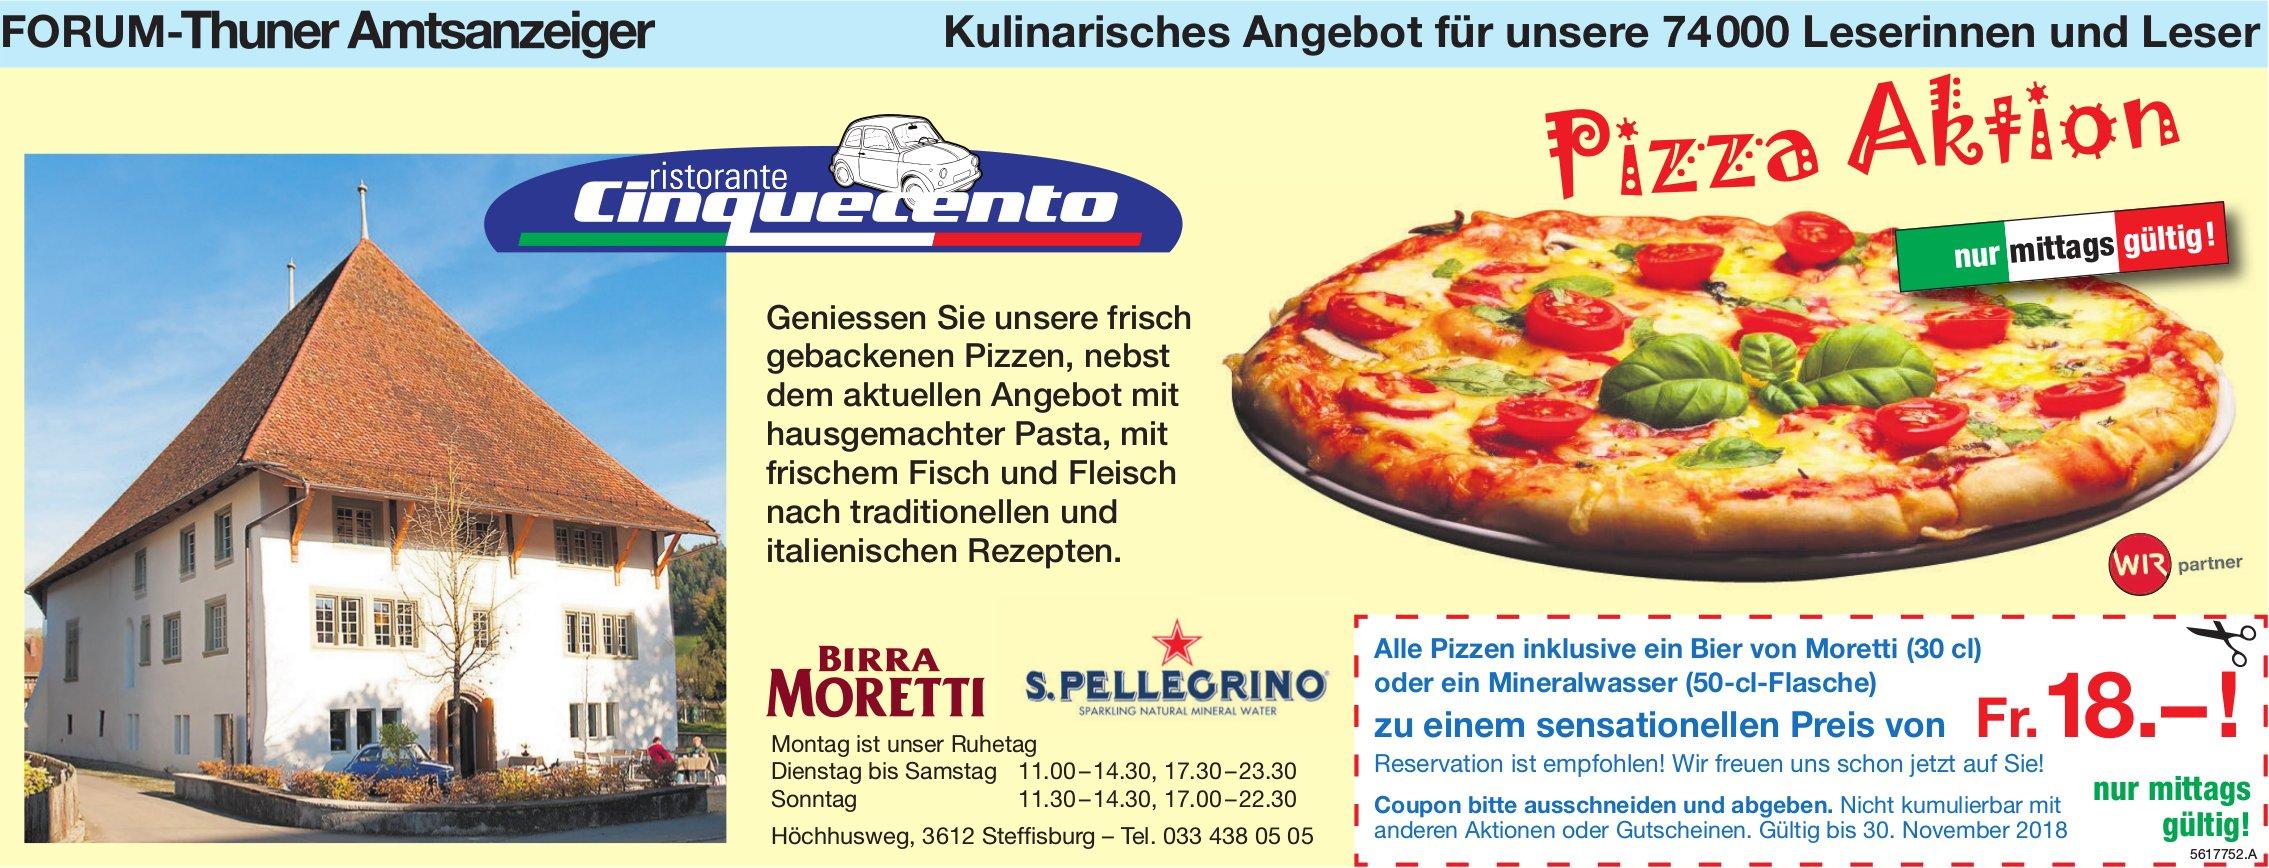 Forum-Thuner Amtsanzeiger - Ristorante Cinquecento: Pizza Aktion